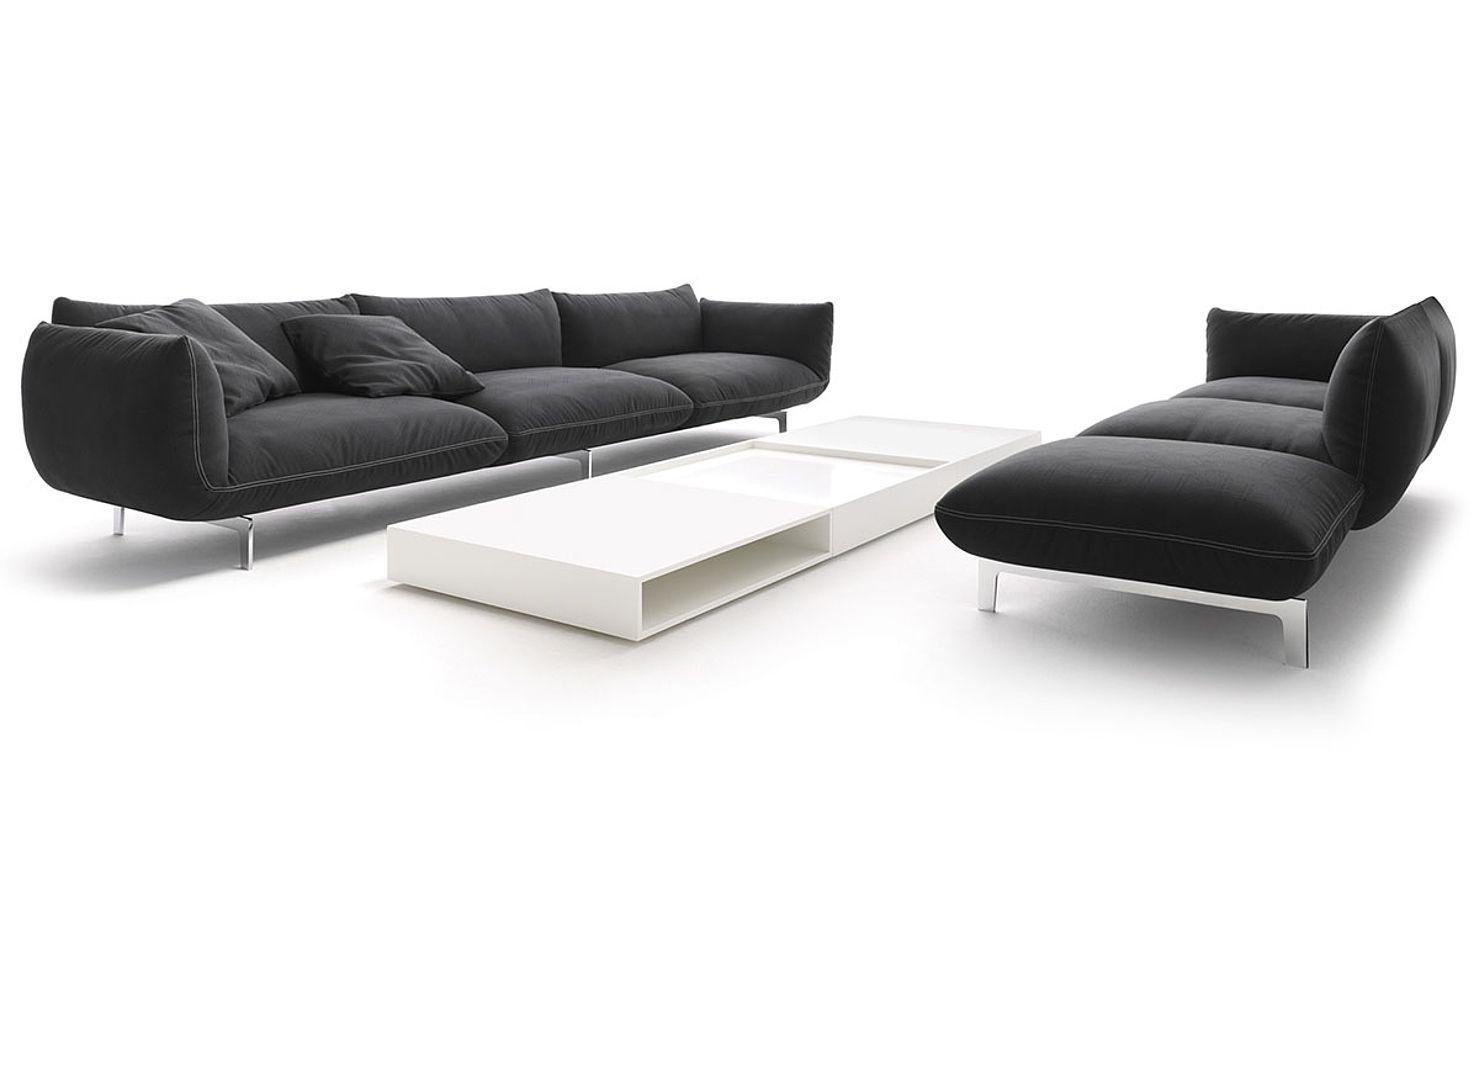 Name: Jalis sofa / Designer: Jehs + Laub / Manufacturer: COR ...